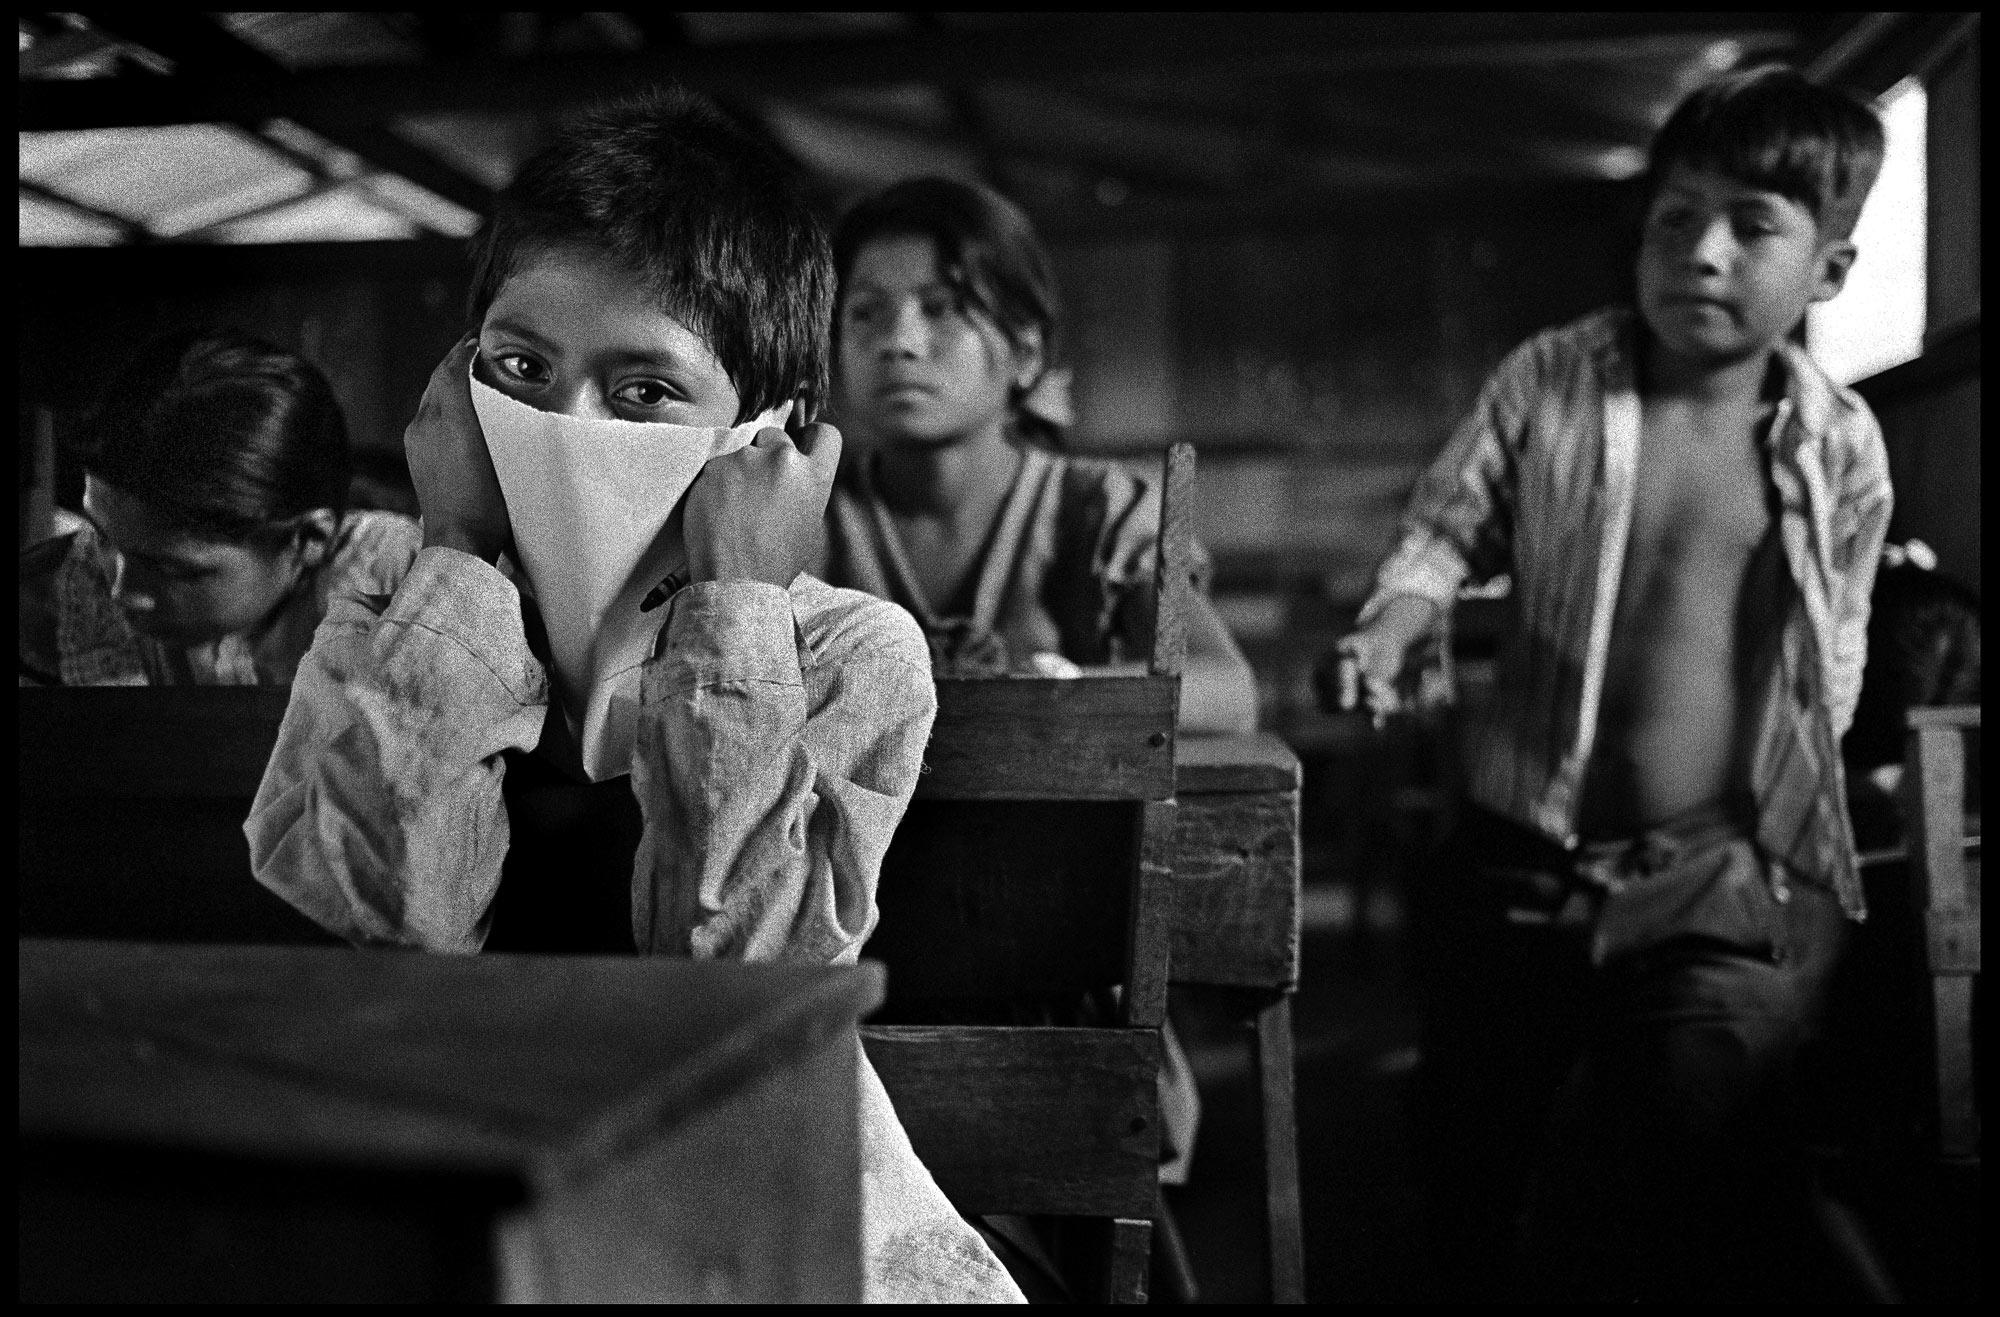 School children show support for Zapatista rebels, Chiapas, Mexico